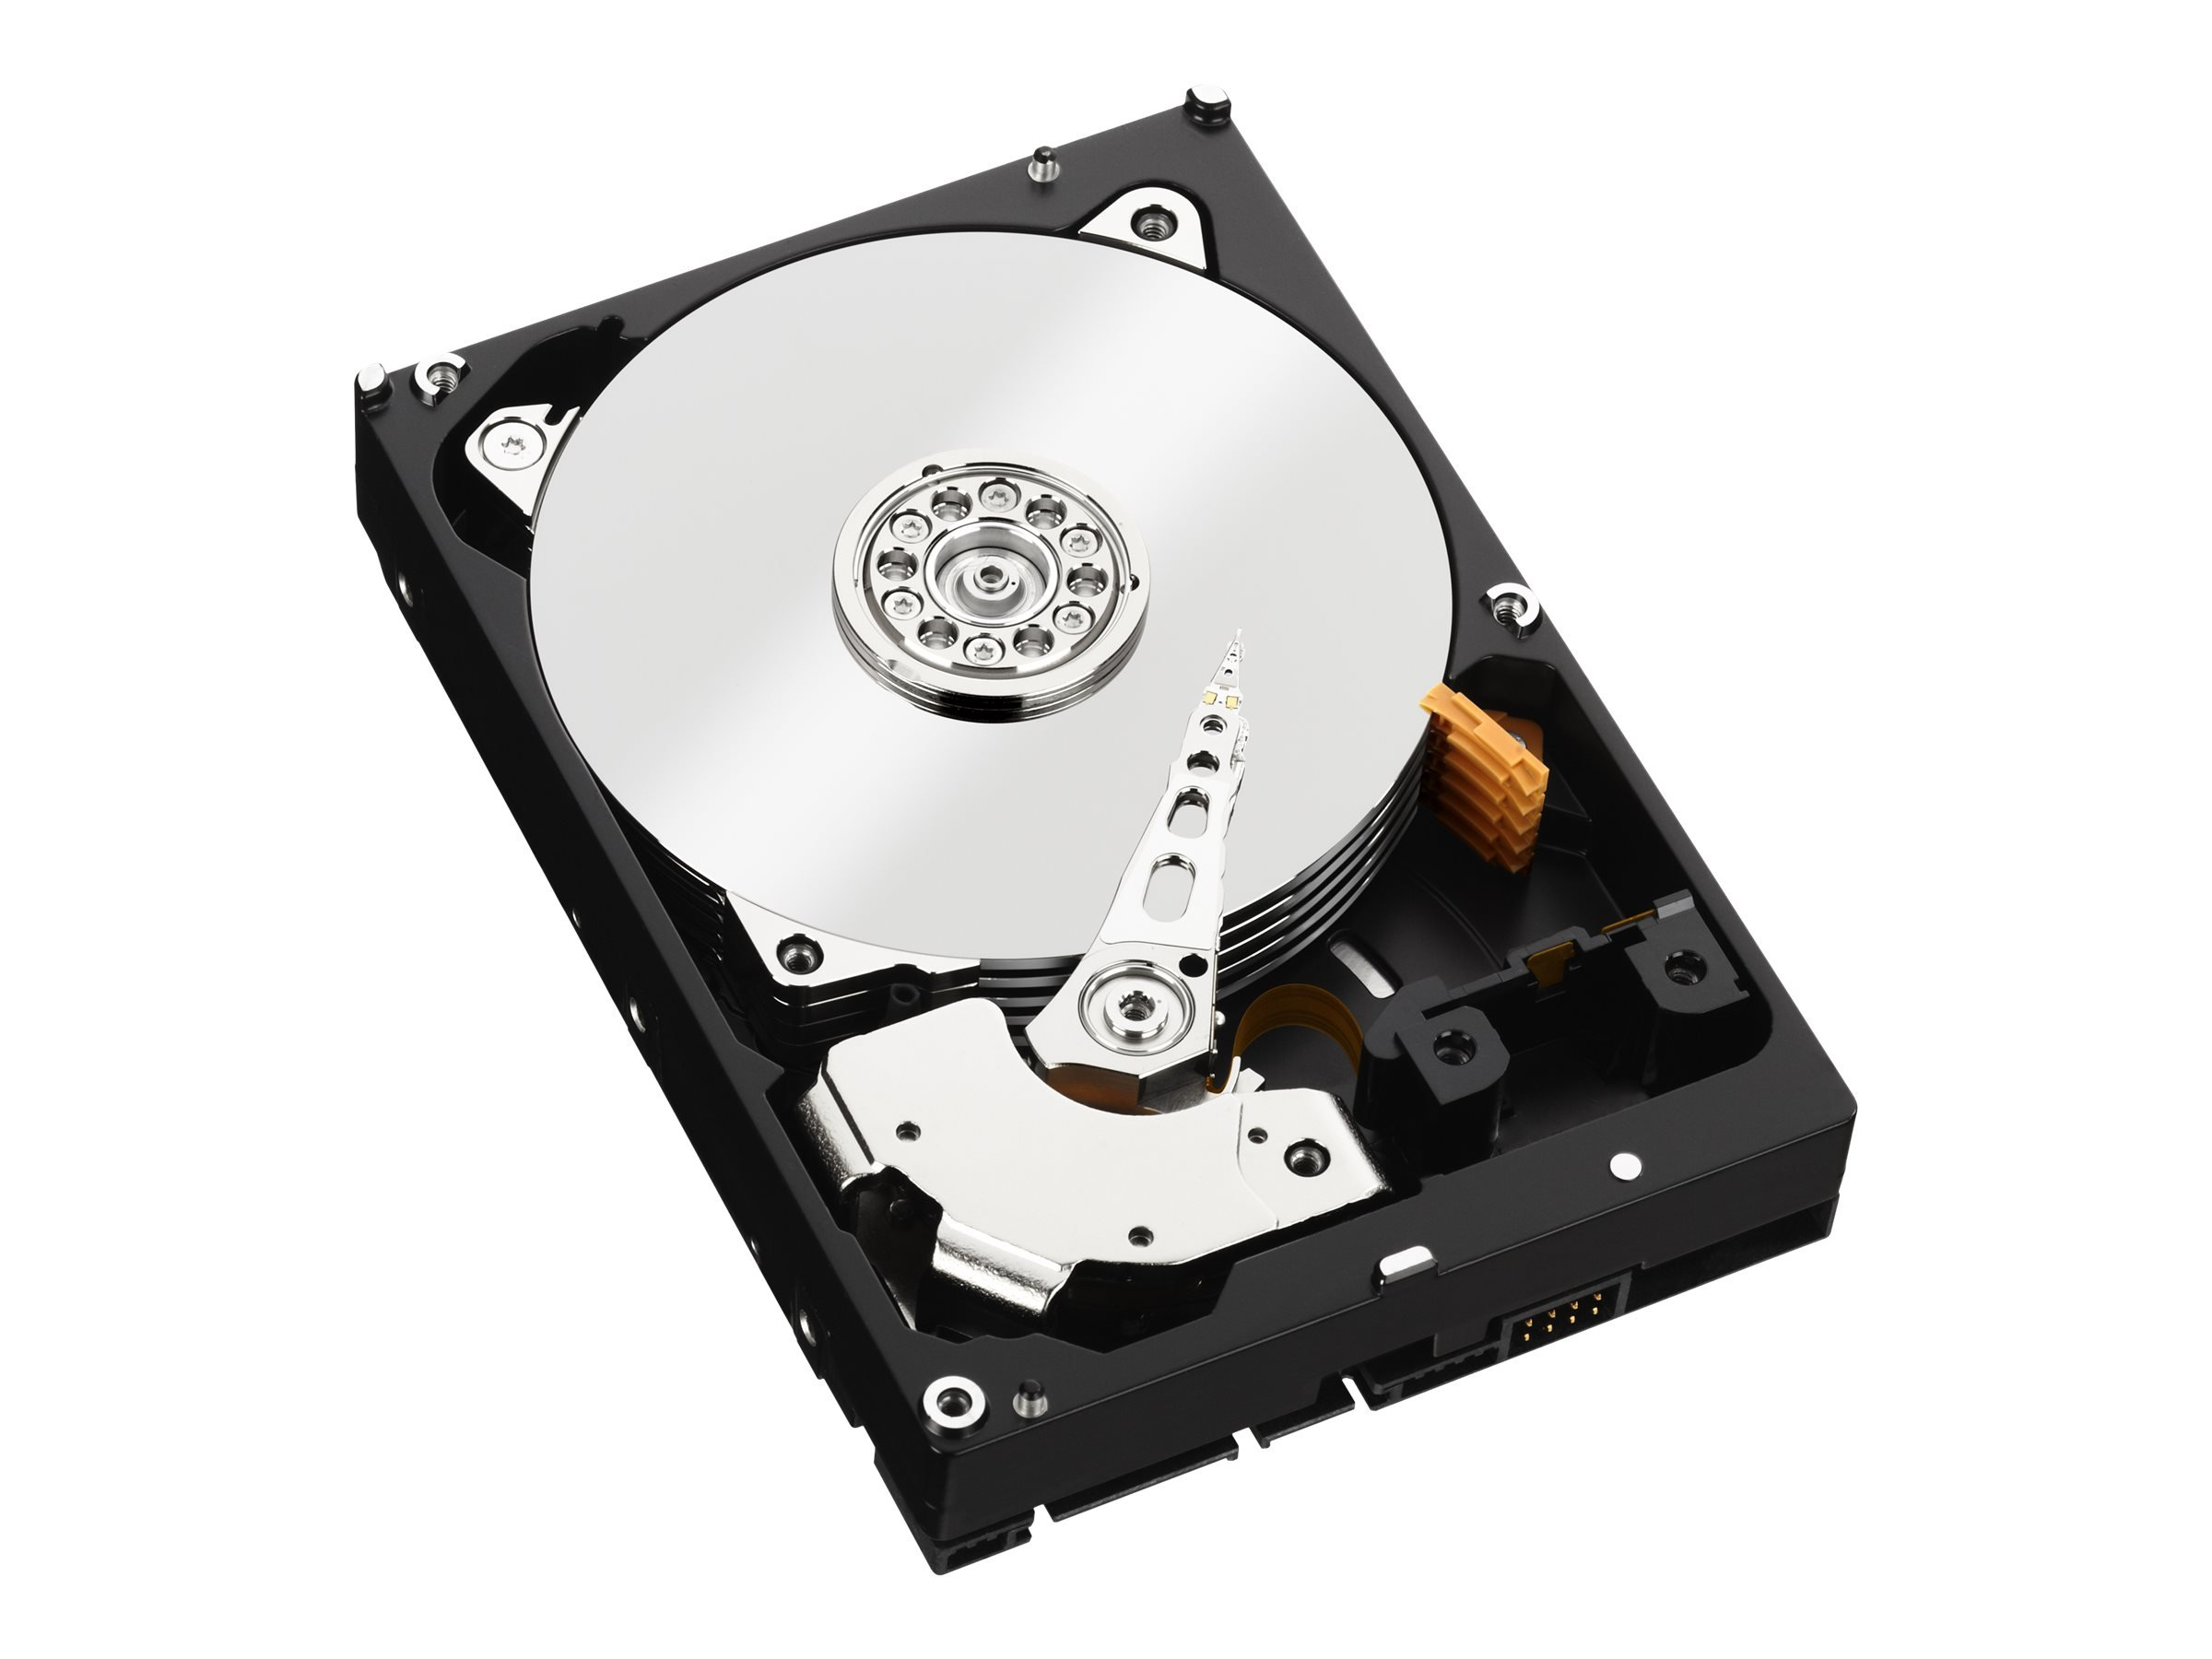 WD 1 TB WD RE SATA III 7200 RPM 64 MB Cache Bulk/OEM Enterprise Hard Drive WD1003FBYZ by Western Digital (Image #6)